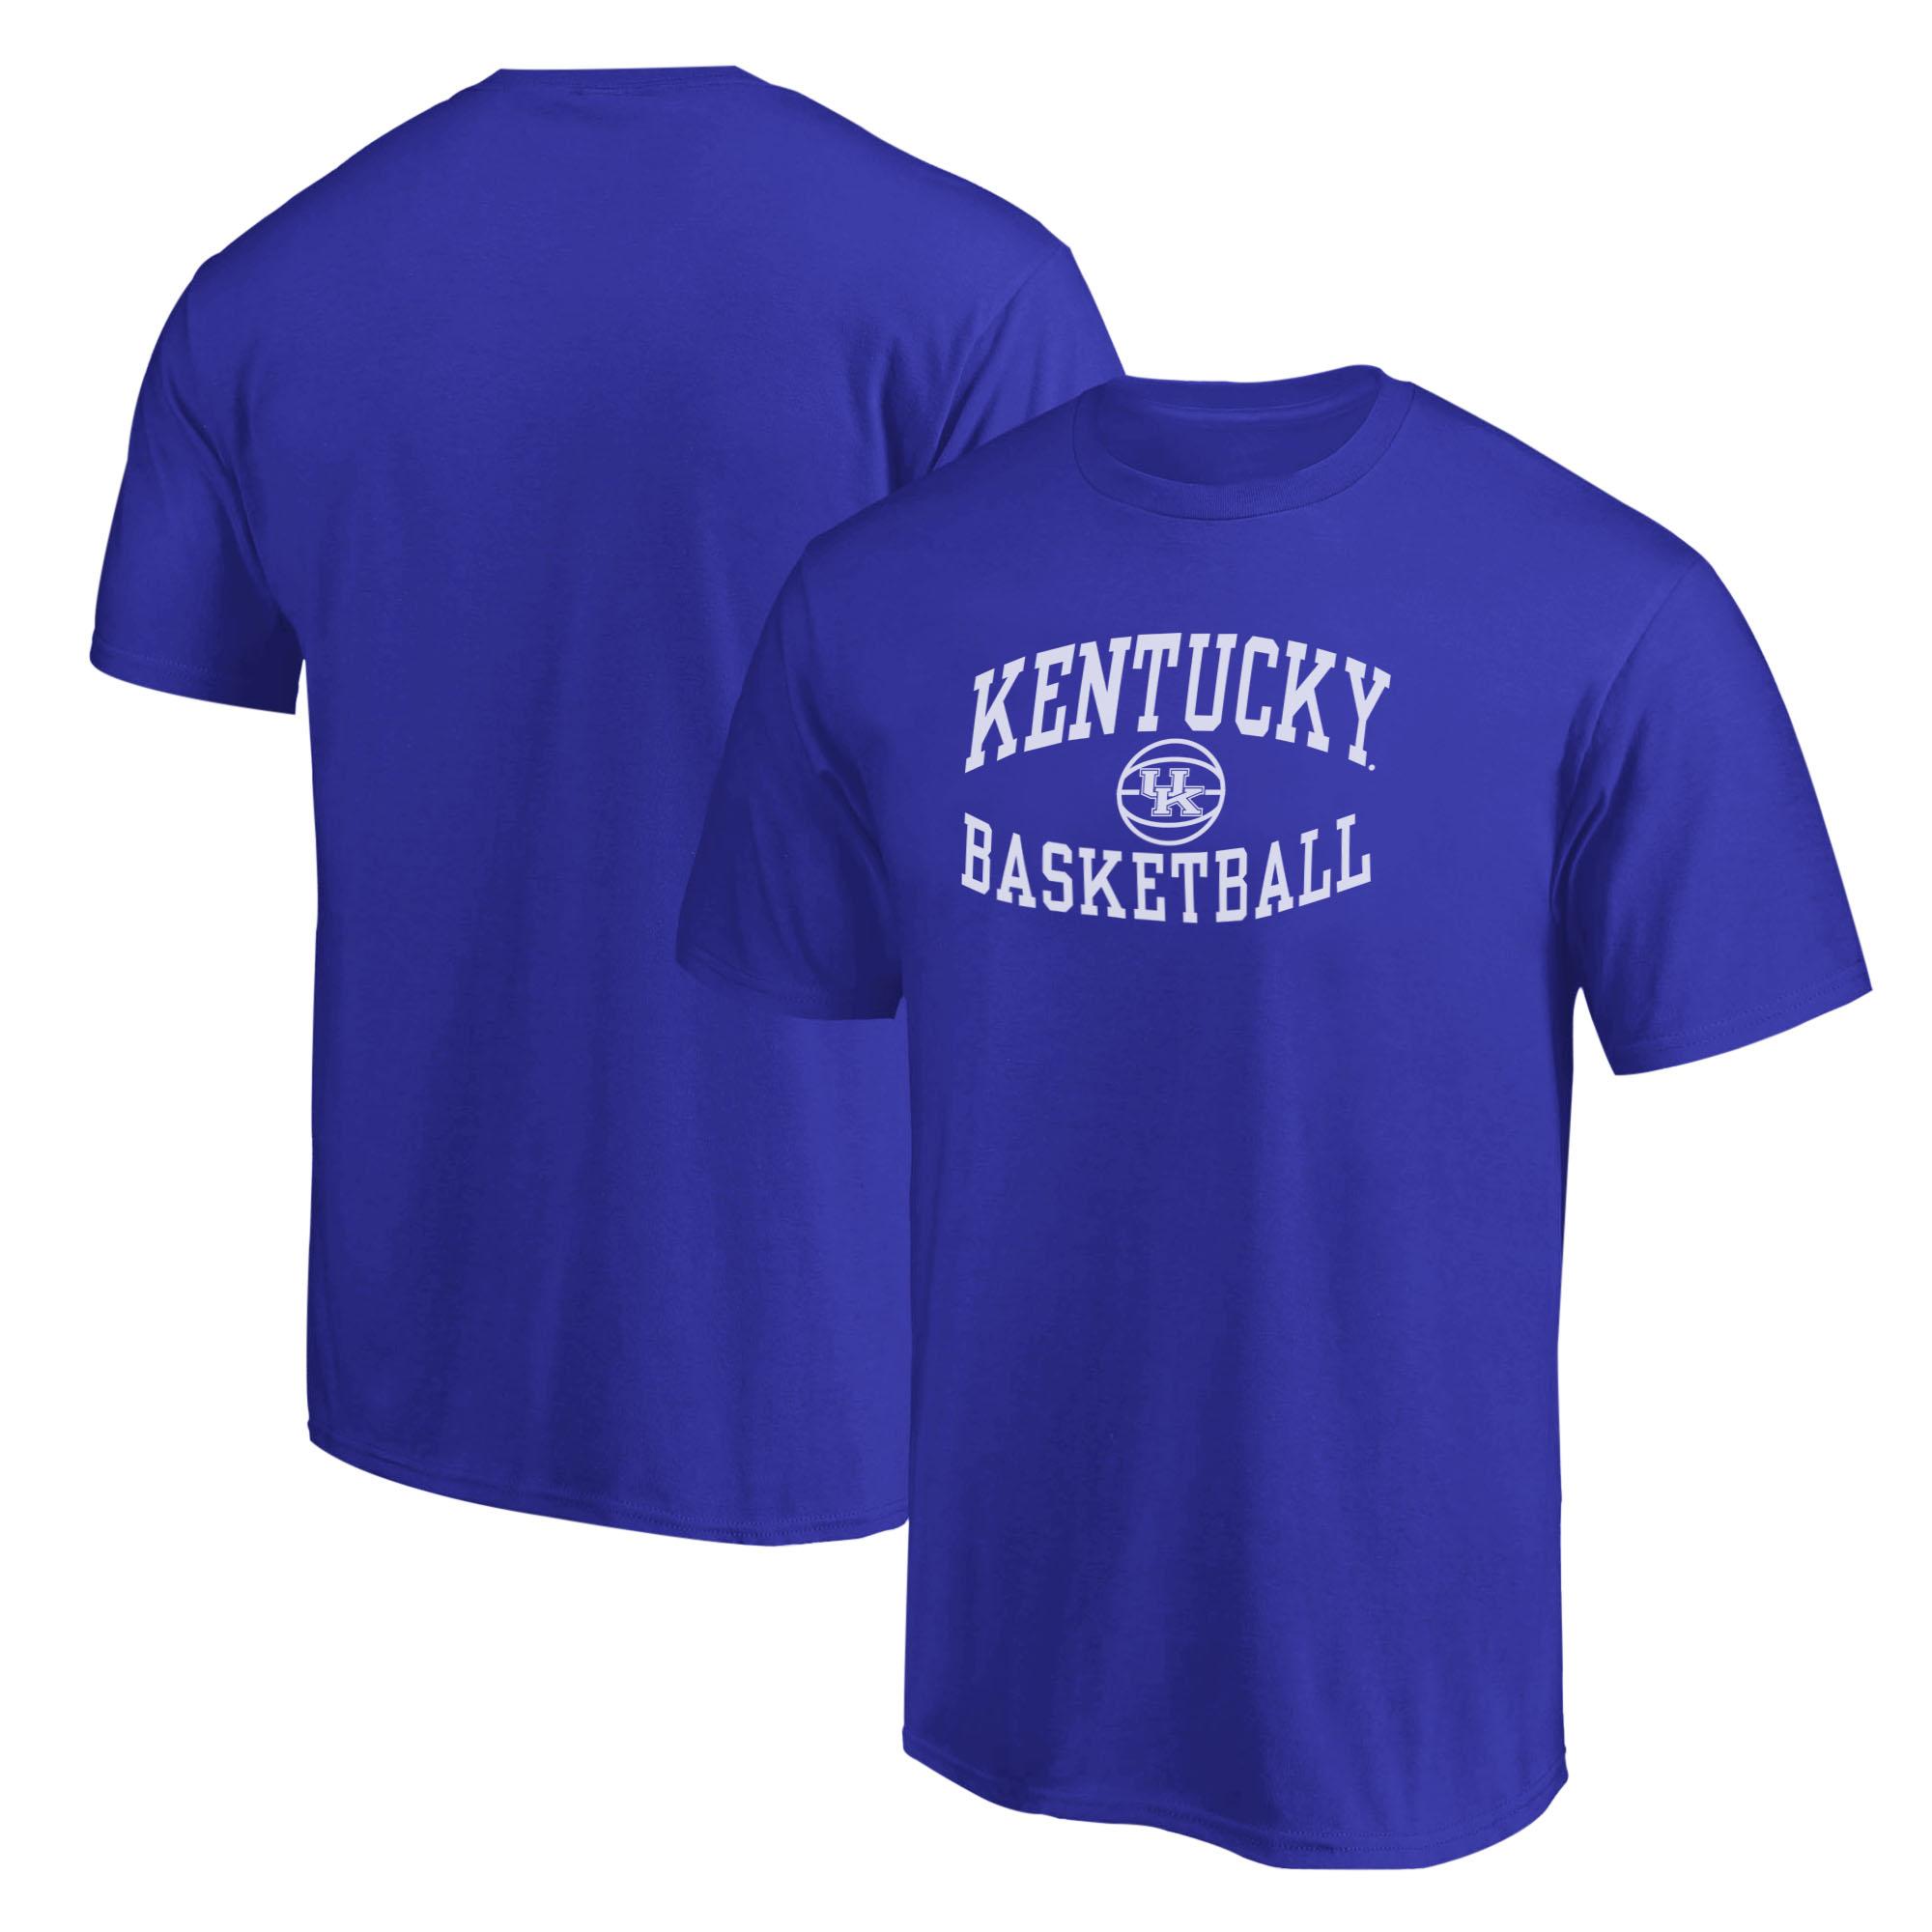 Kentucky Wildcats Tshirt (TSH-BLU-235-NCAA-KNTC-WILD)